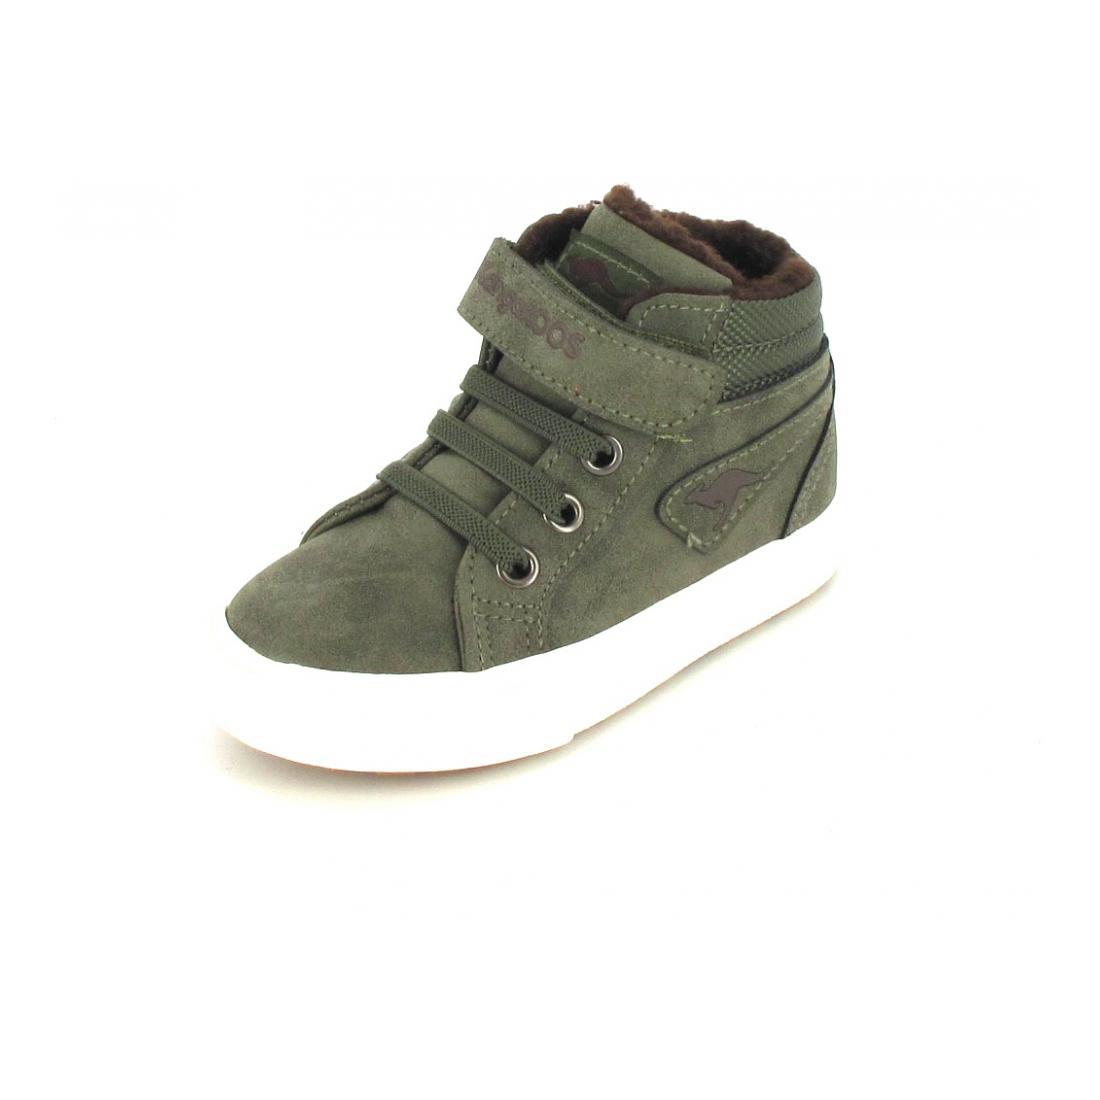 KangaRoos Sneaker KaVu III